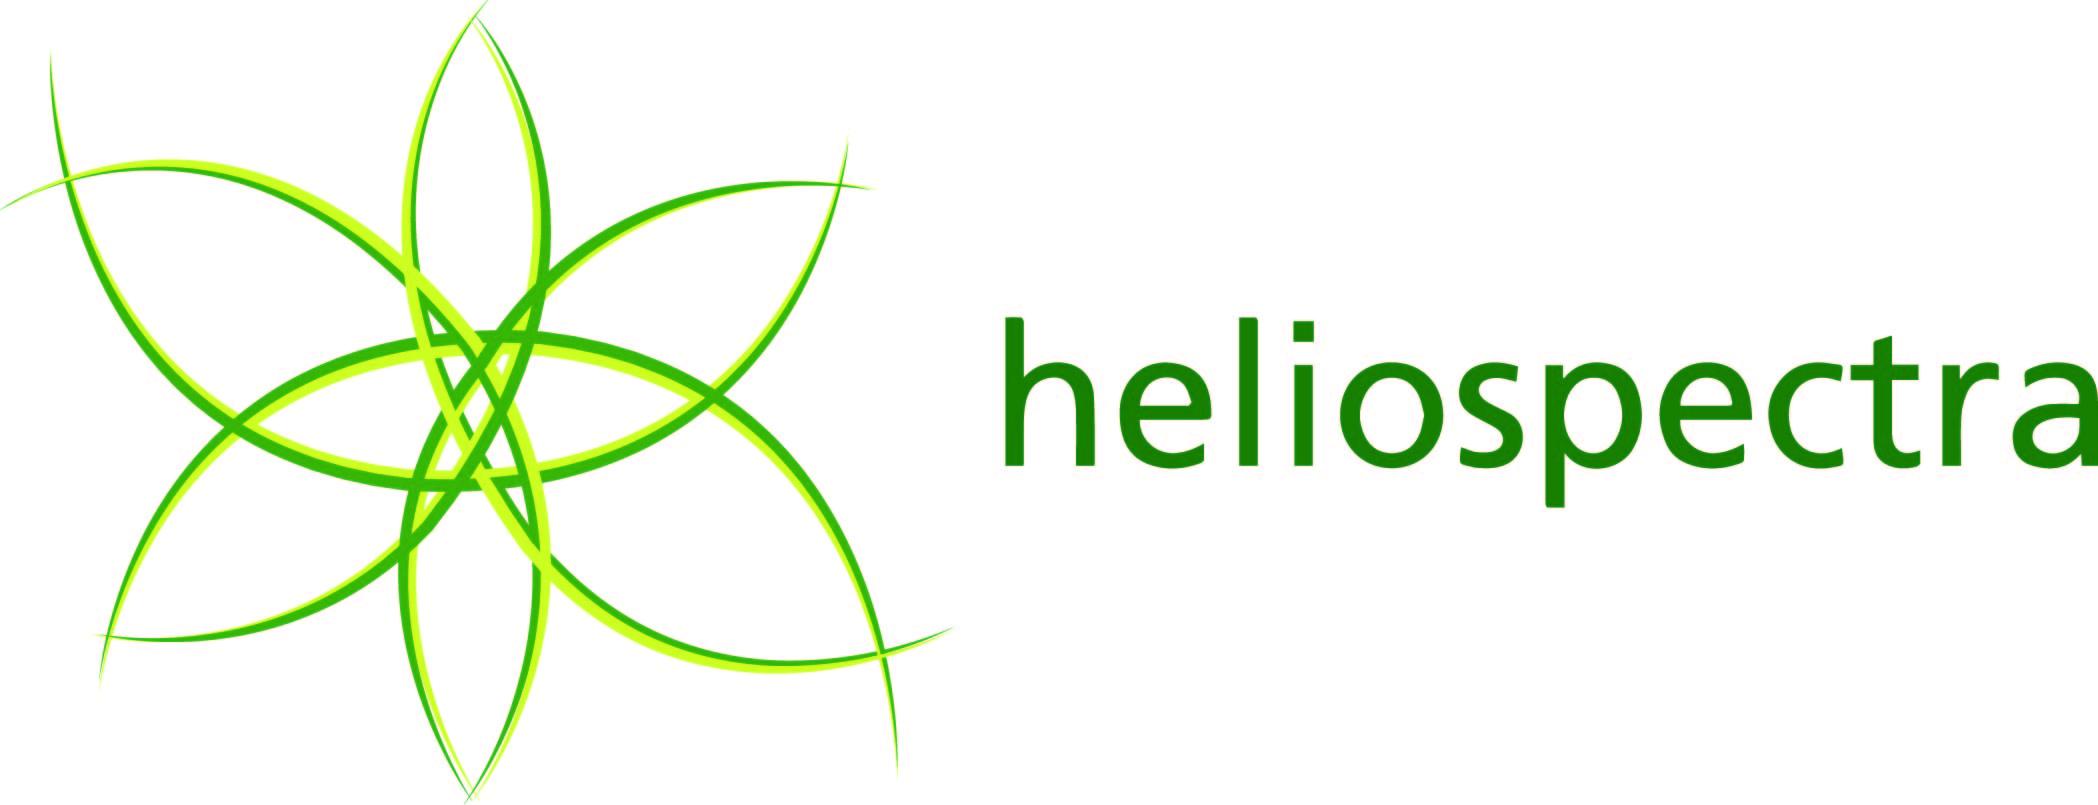 Heliospectra-logo-2colors (1).jpeg